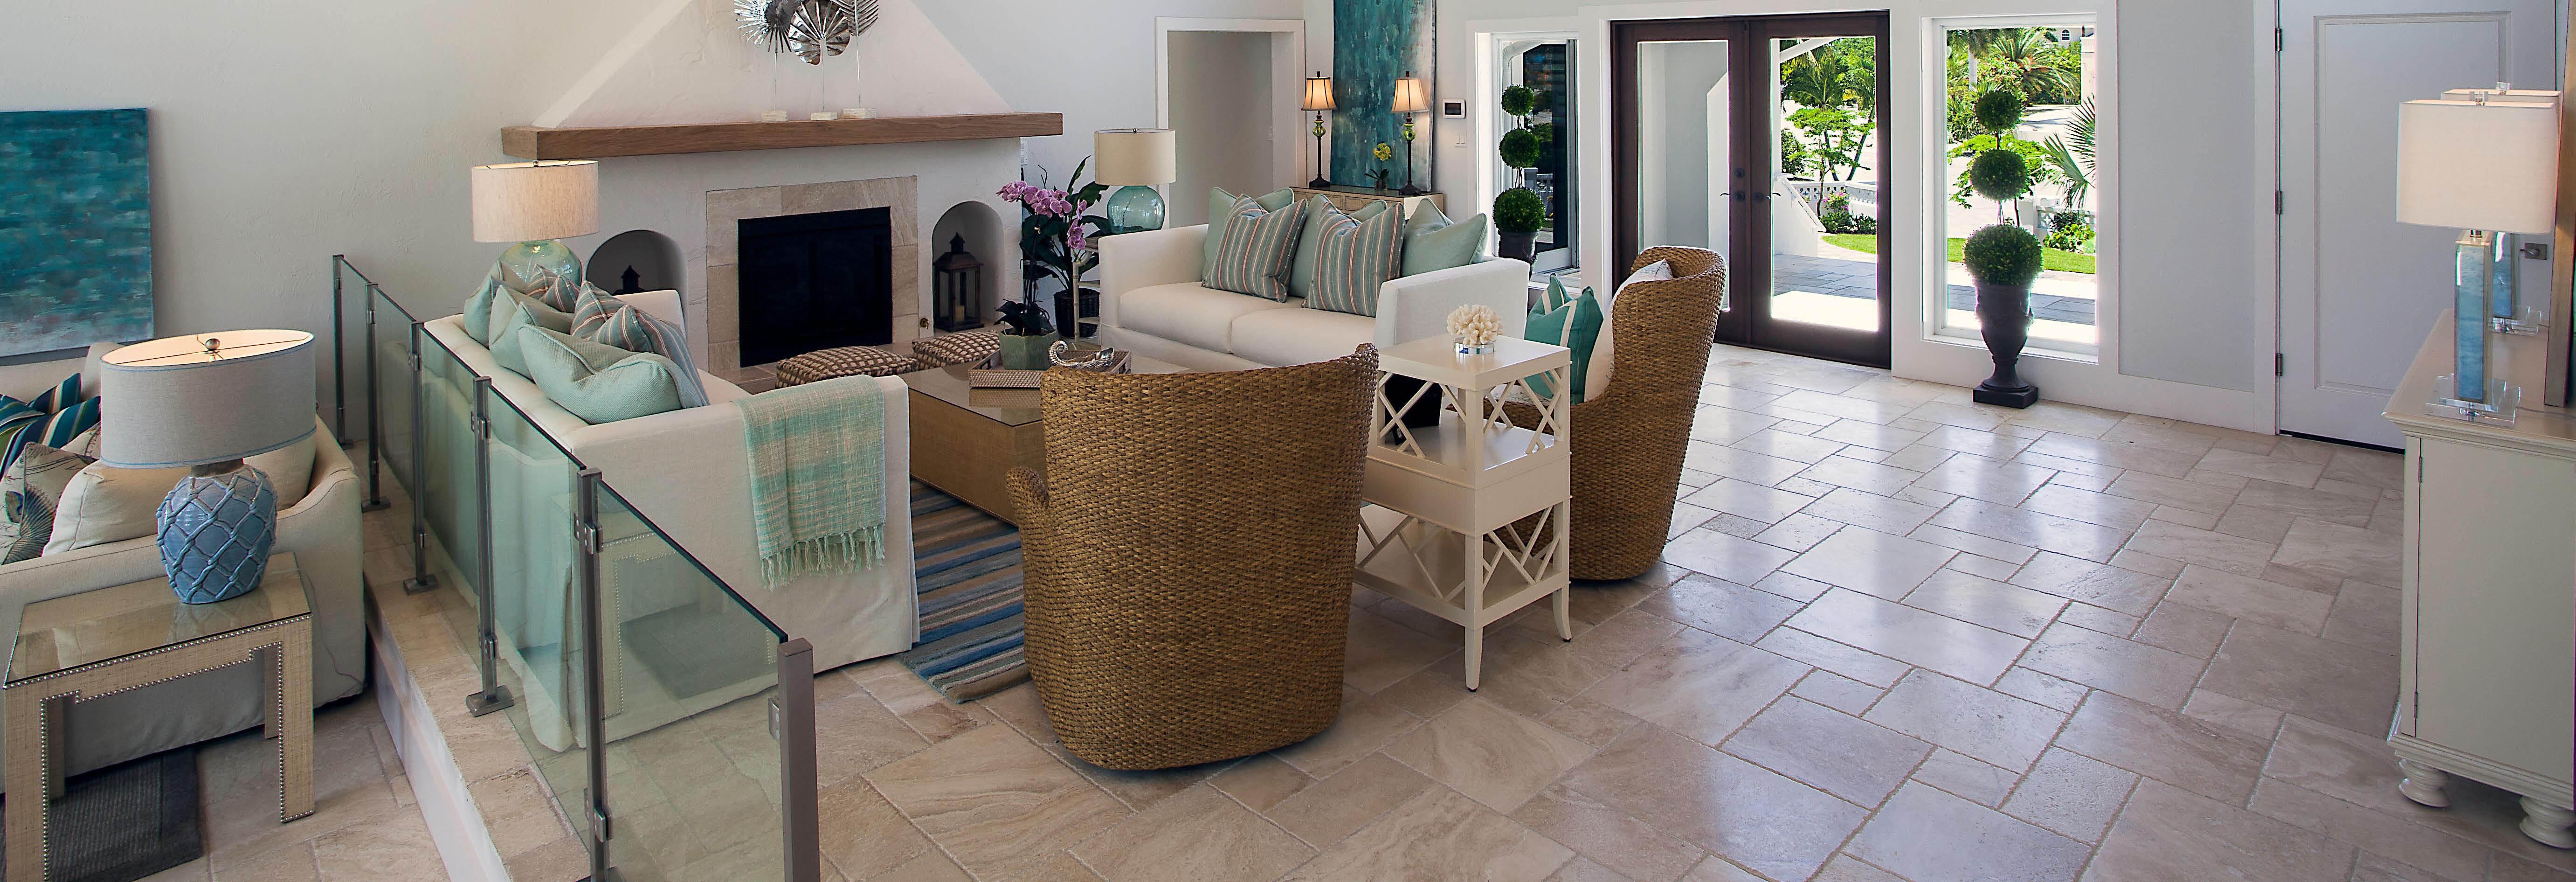 stone-mart stonemart home stone decor home flooring driveway pool